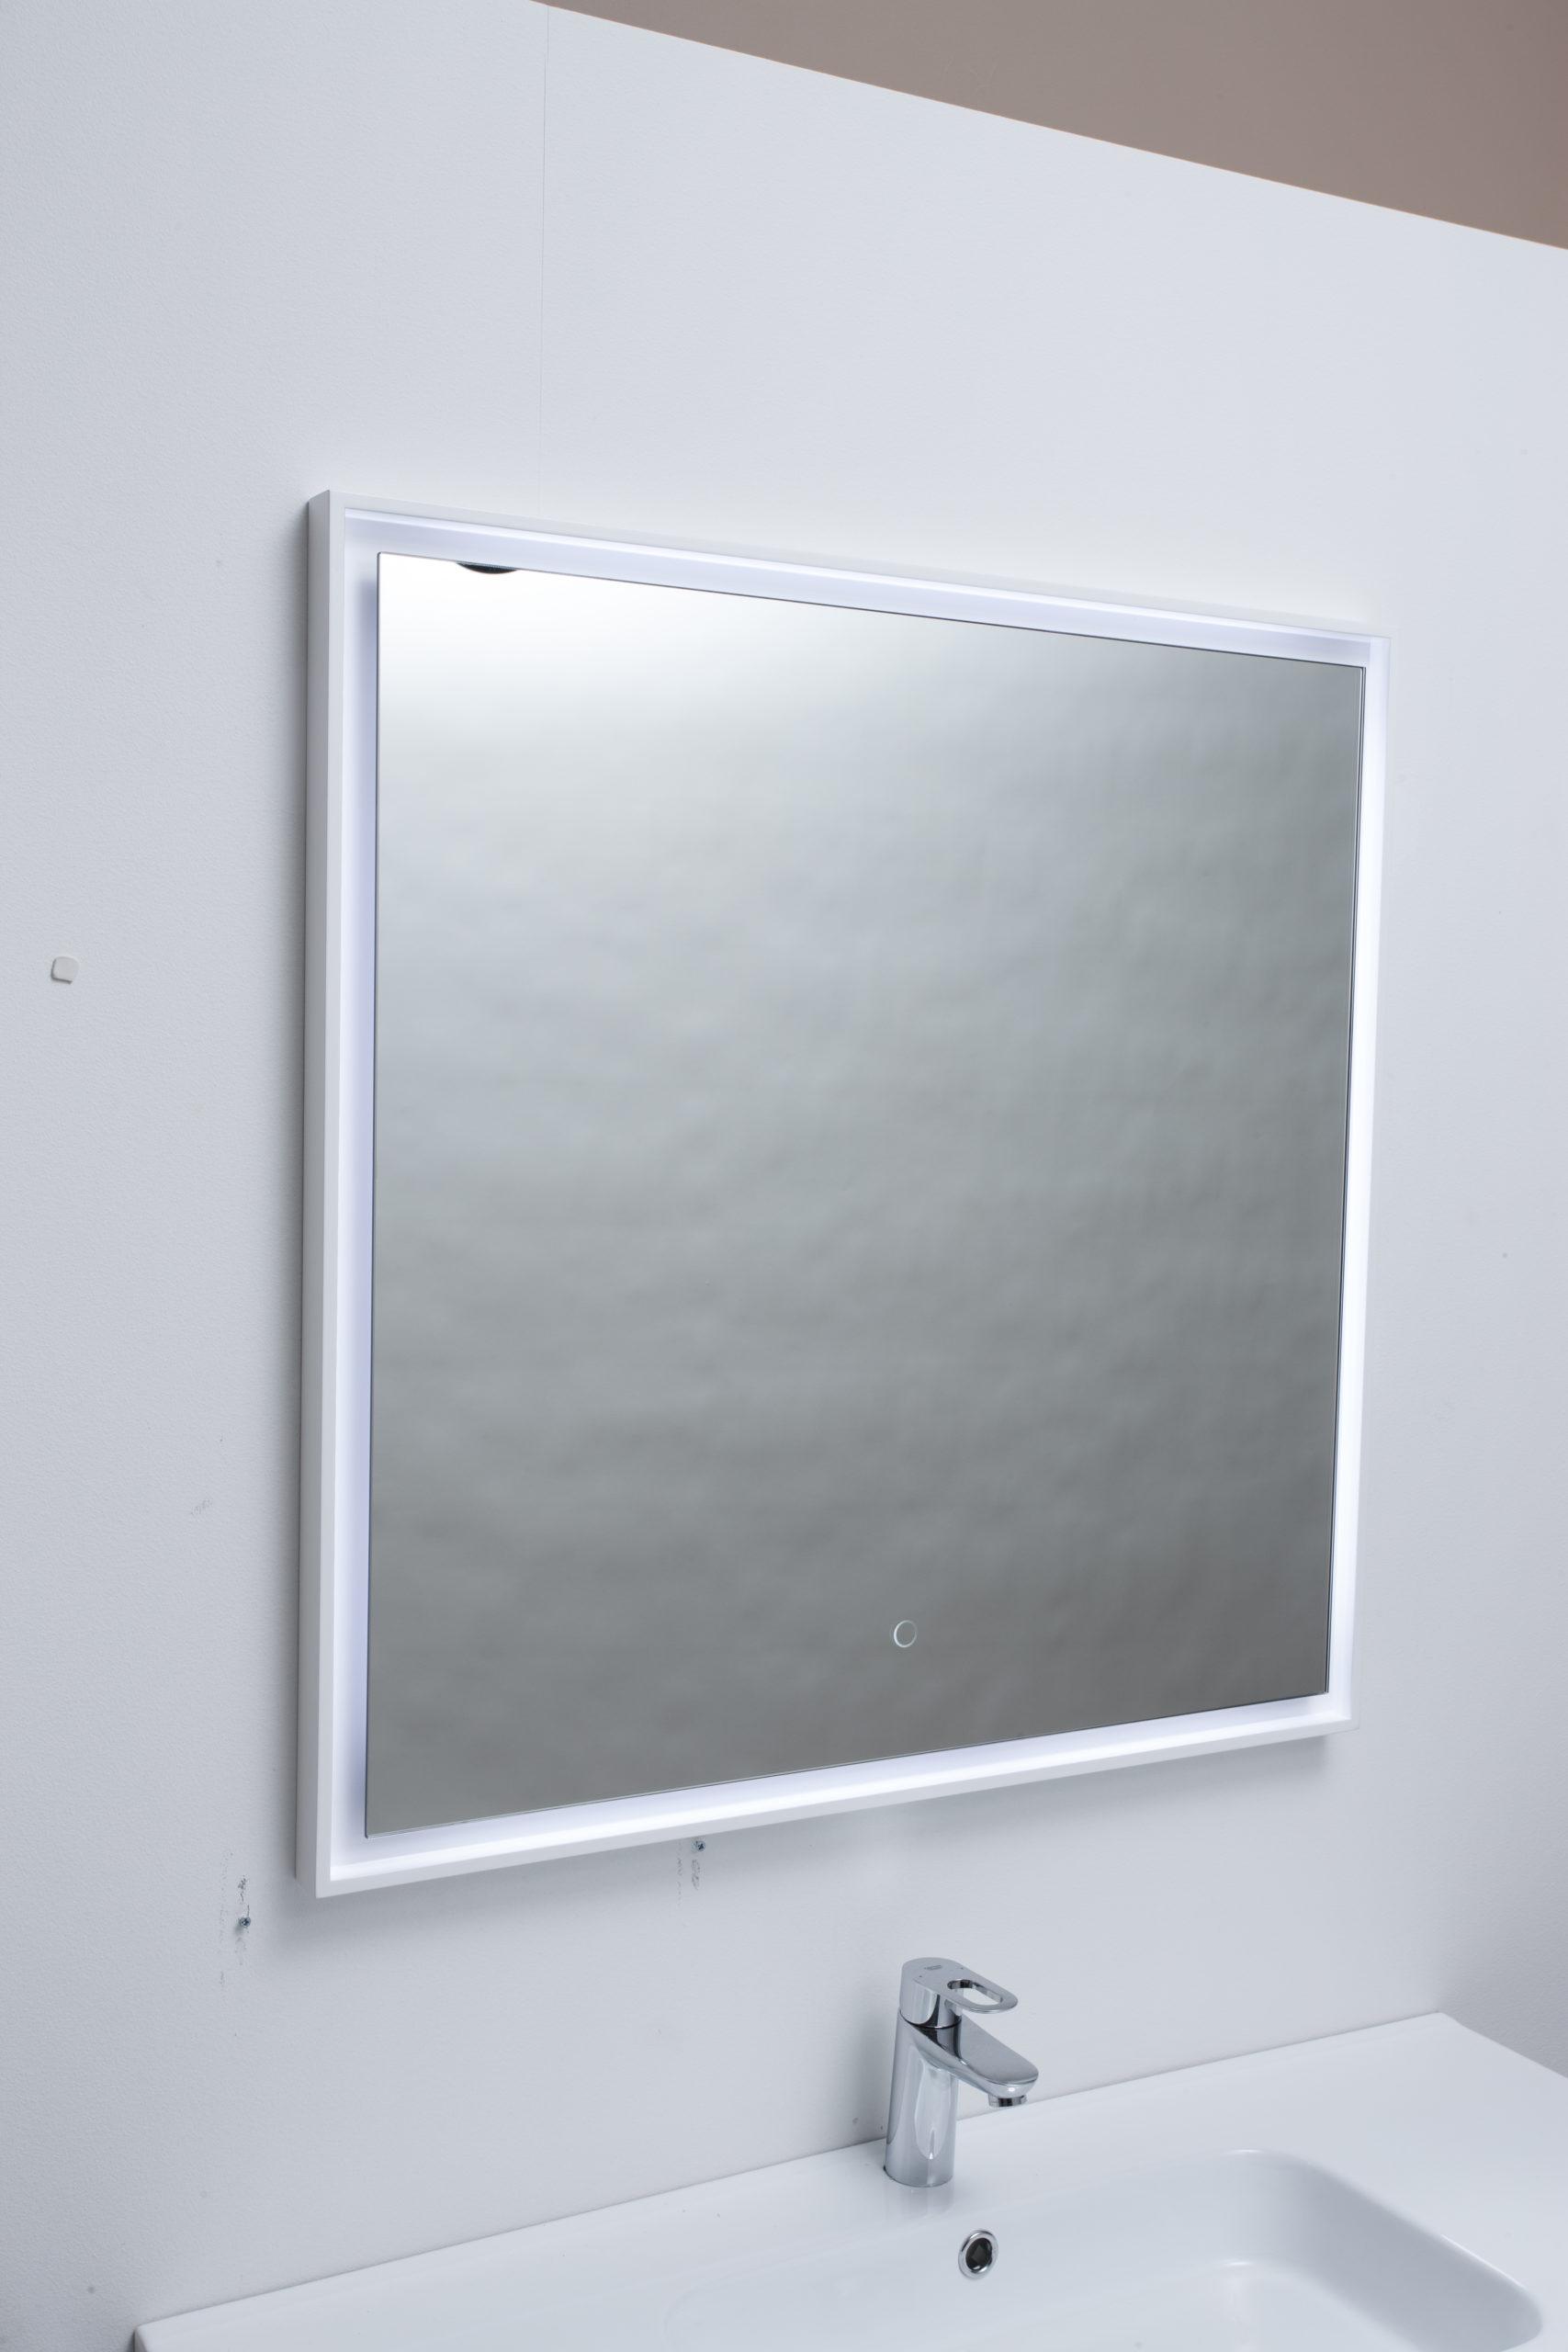 Picture of: Spar Nu 50 Pa Fano Spejl I Hvid Ramme Firkantet Fano Spejl I Ramme